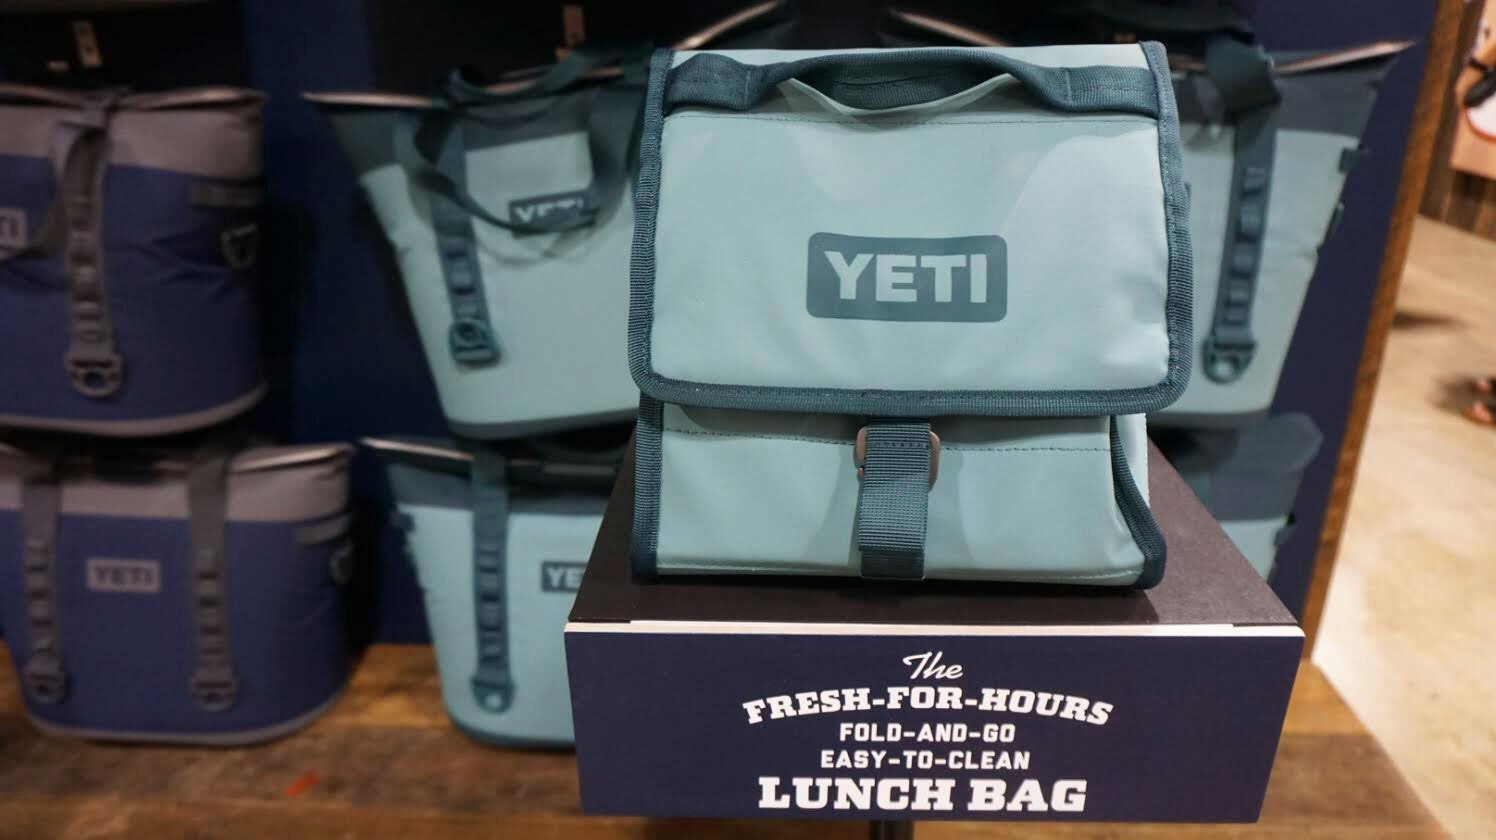 yeti-lunchbag.jpg